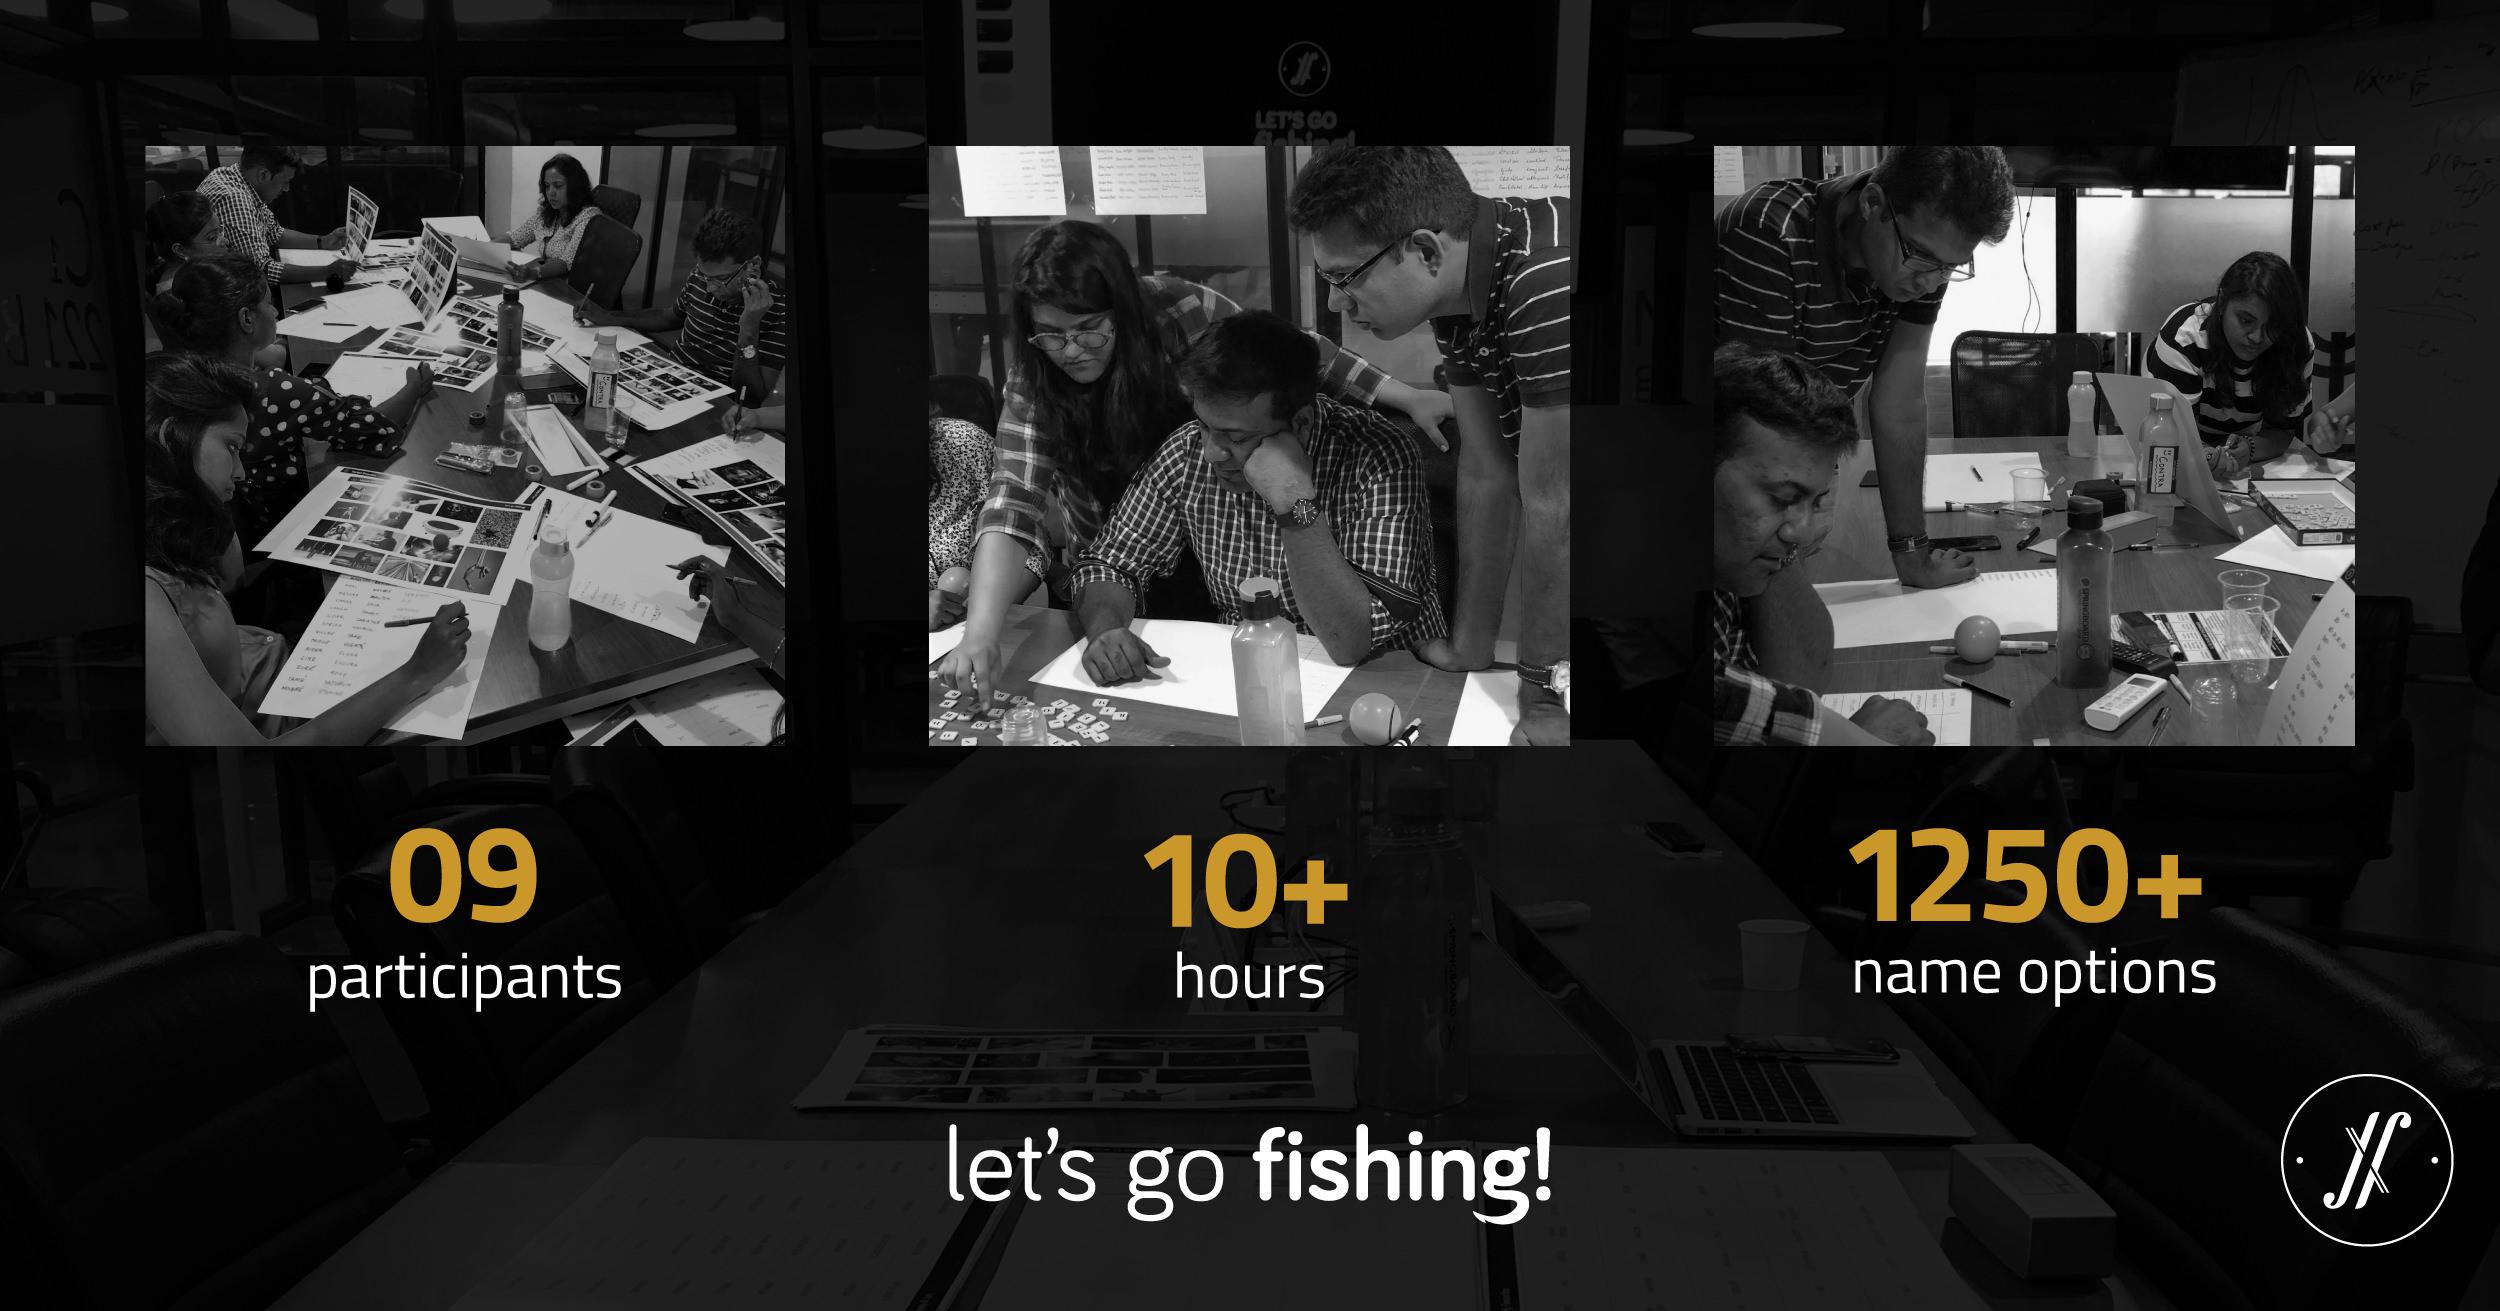 Yellow Fishes Branding Agency Mumbai Best creative branding strategy and brand design agency mumbai Auric-lets go fishing brand naming workshop